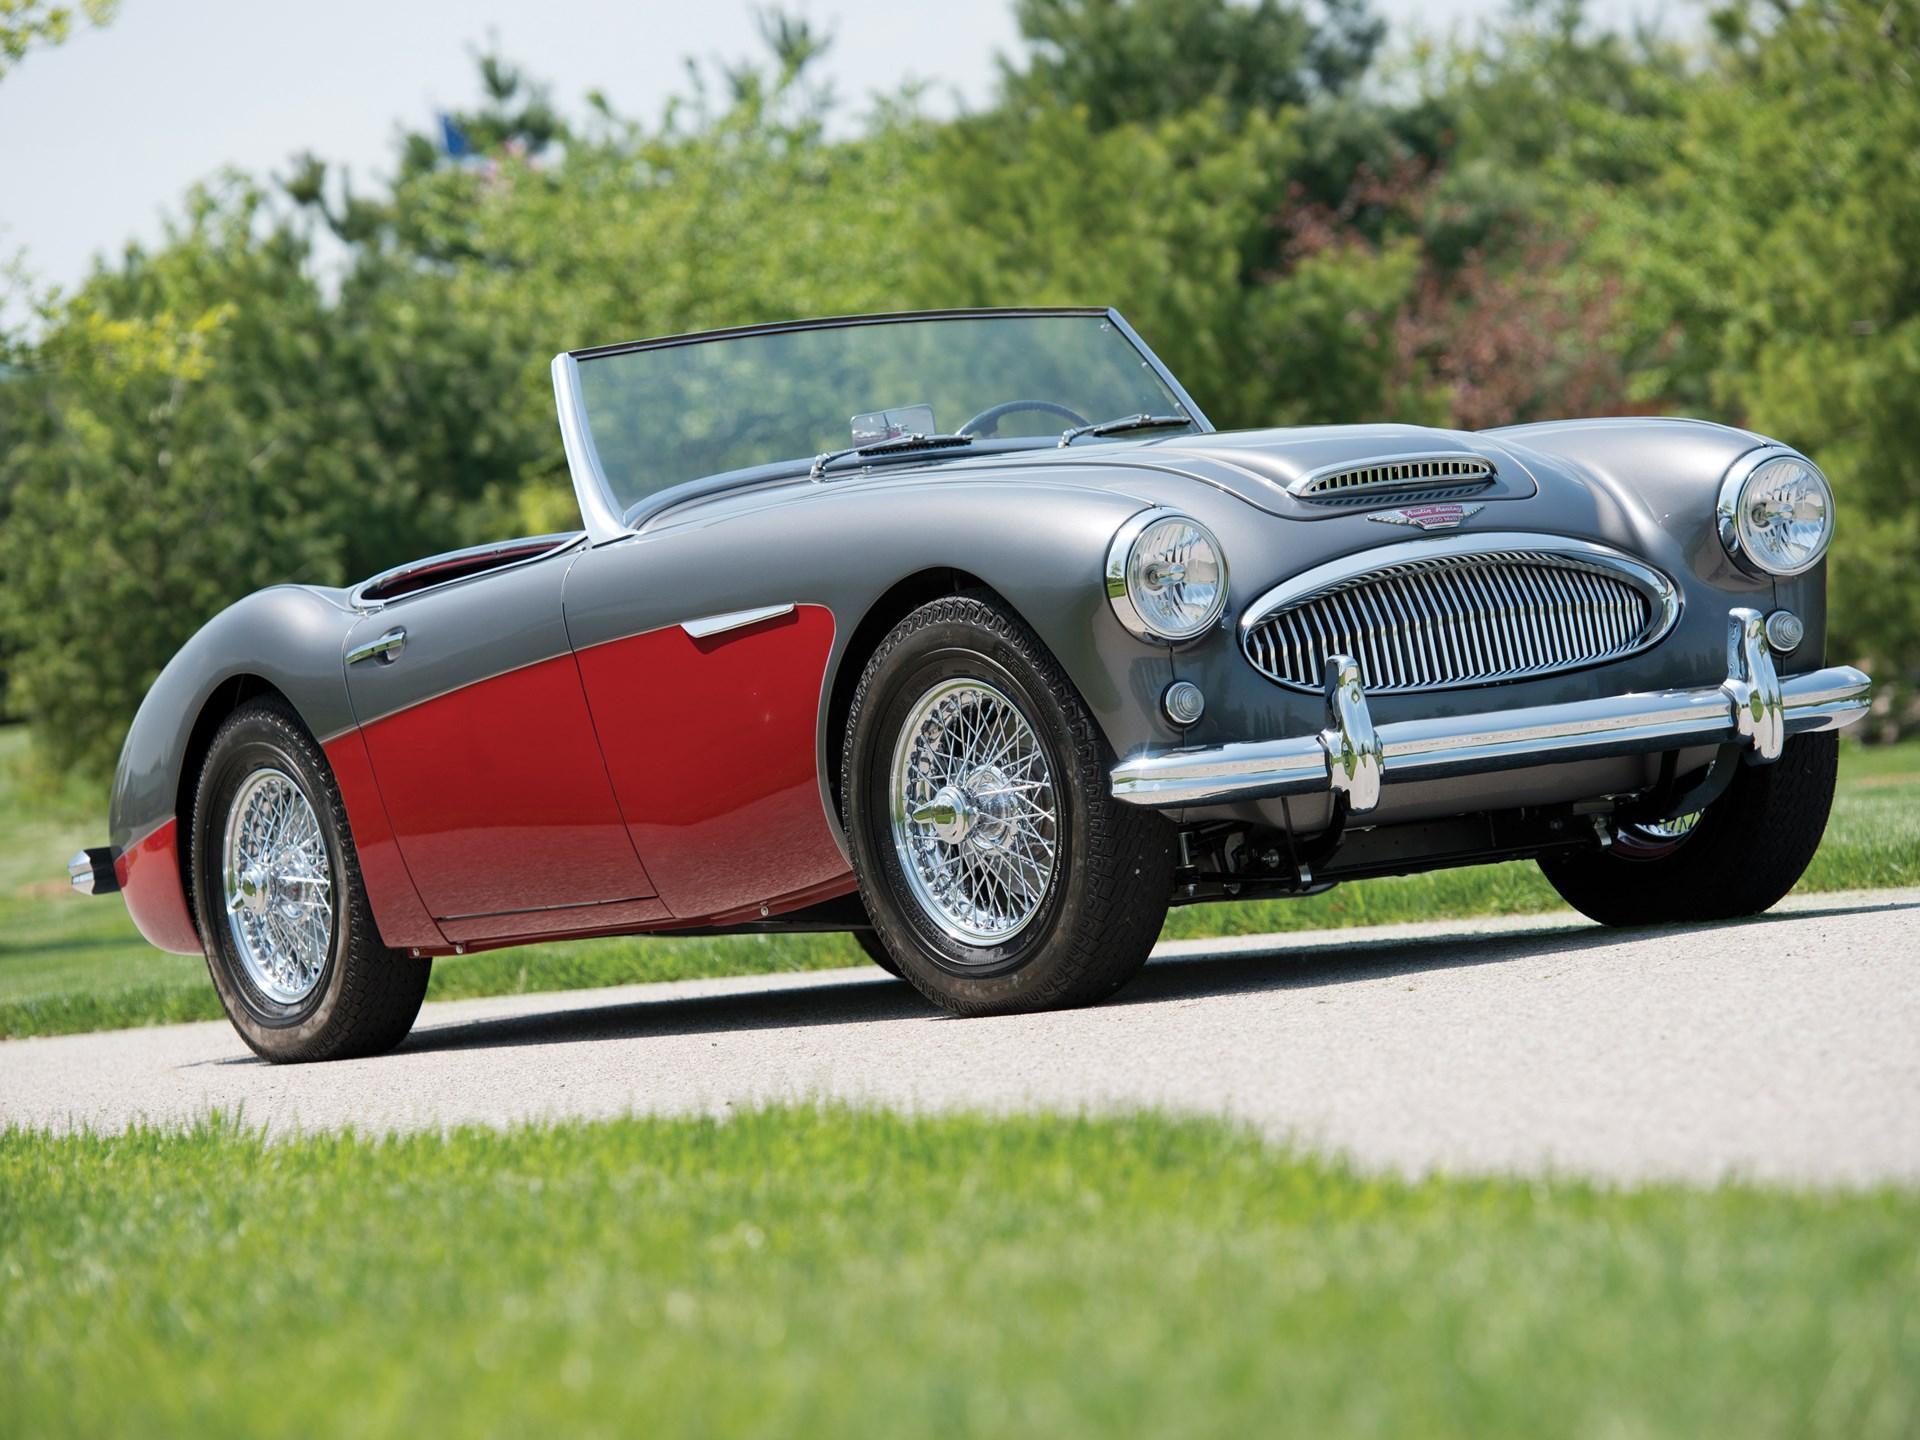 hight resolution of 1961 austin healey 3000 mk ii bn7 roadster